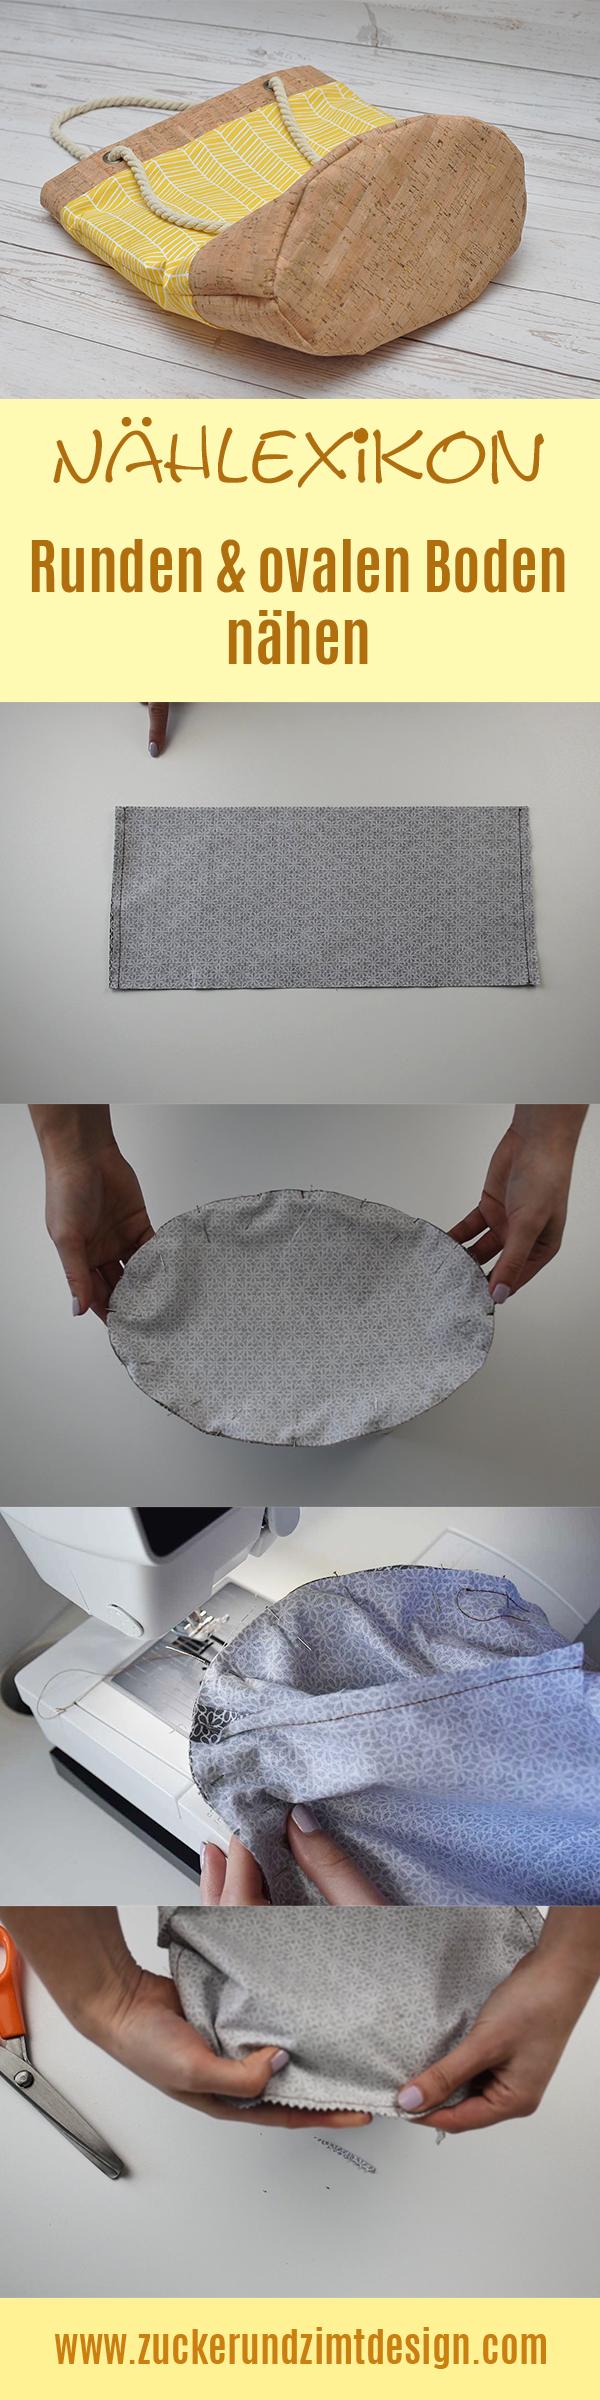 Photo of Sew round and oval bottom [Nählexikon]